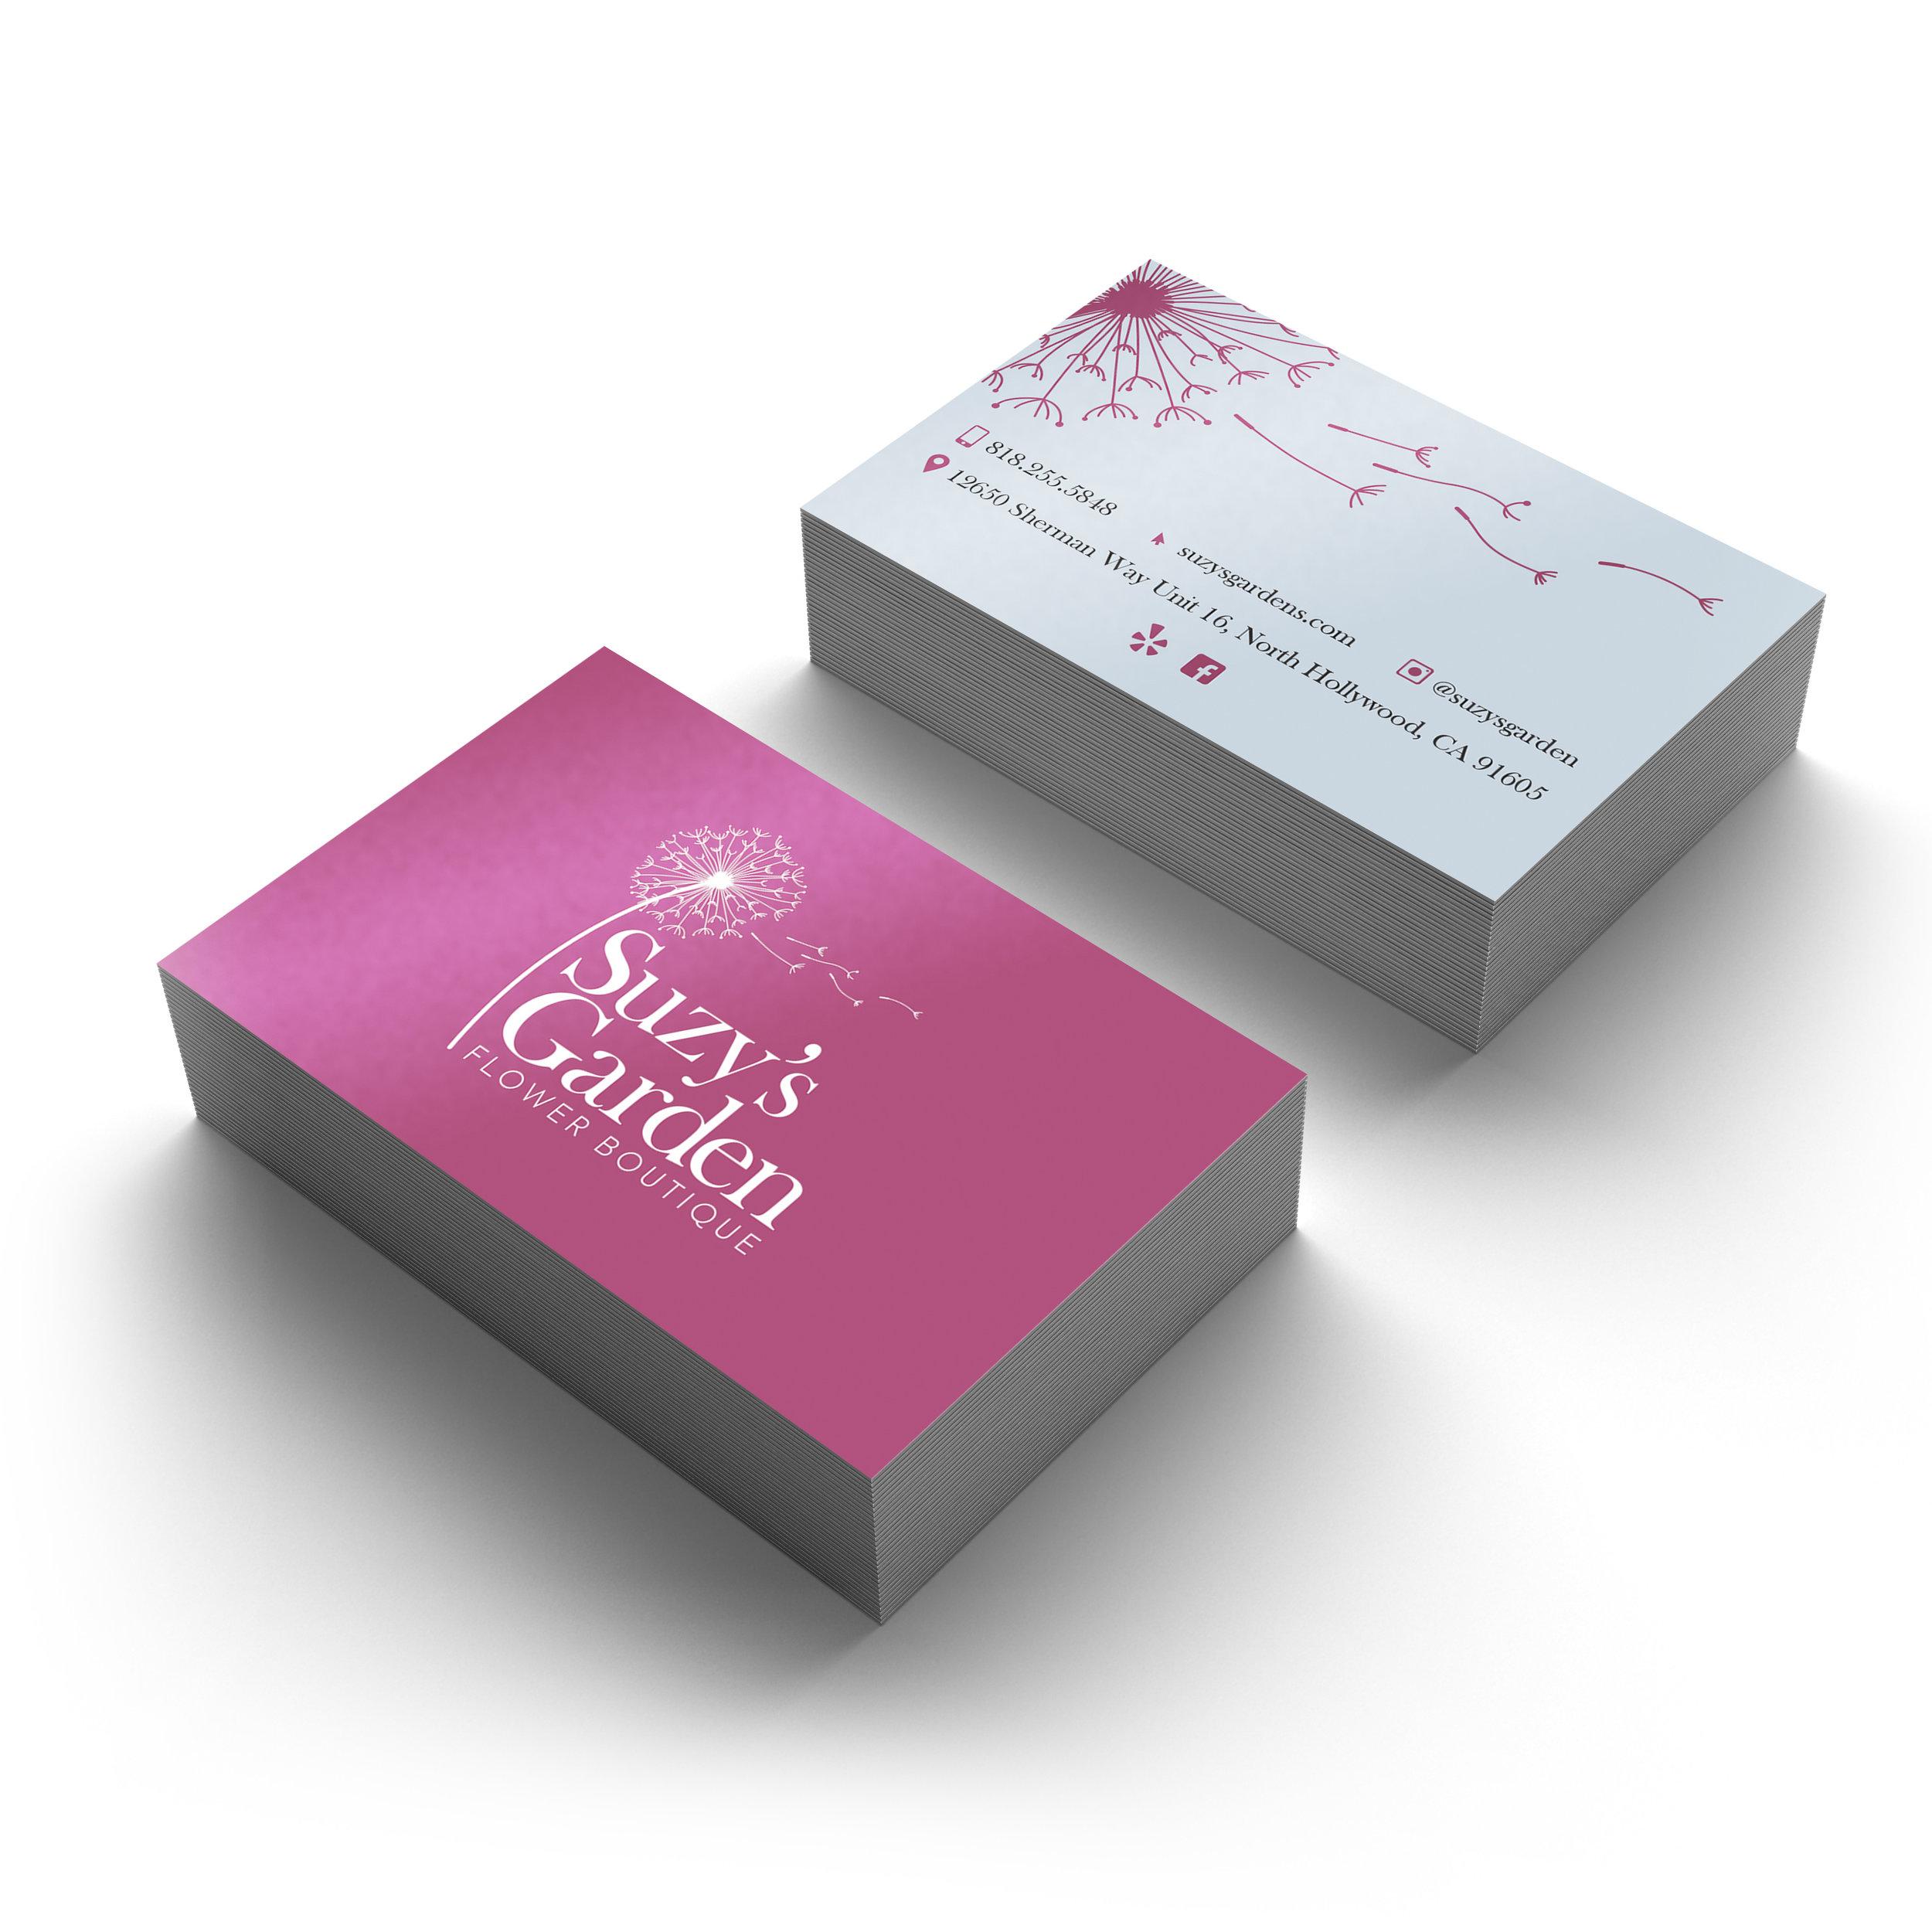 Suzy's Garden Business Card (2)